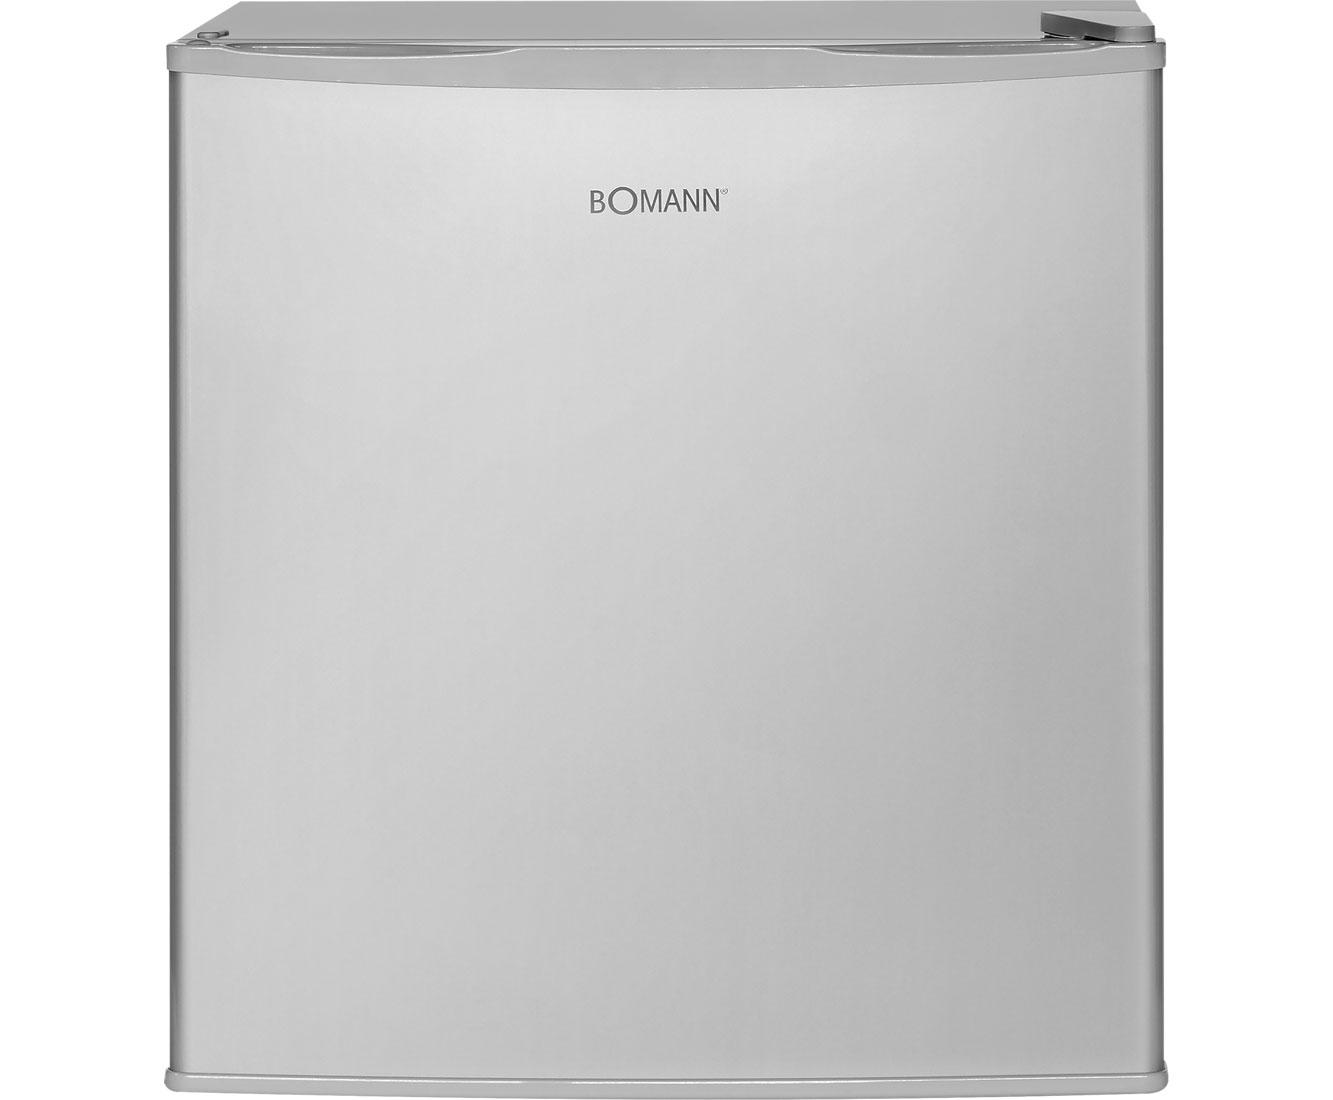 Bomann Kühlschrank Qualität : Bomann kb 340 kühlschrank freistehend 45cm edelstahl optik neu ebay